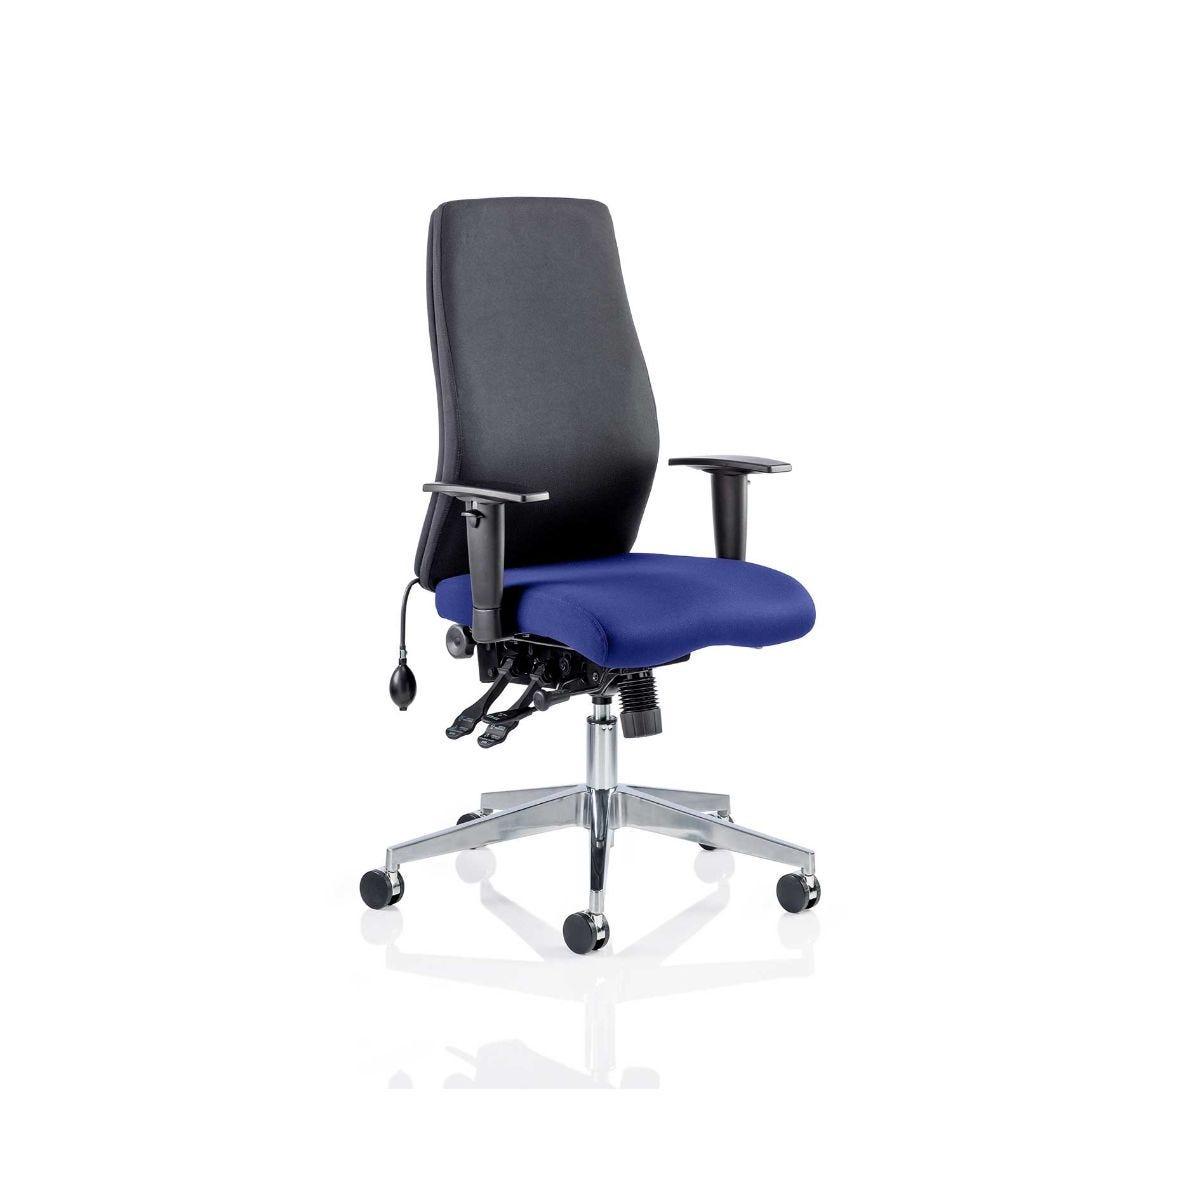 Onyx Office Chair, Serene